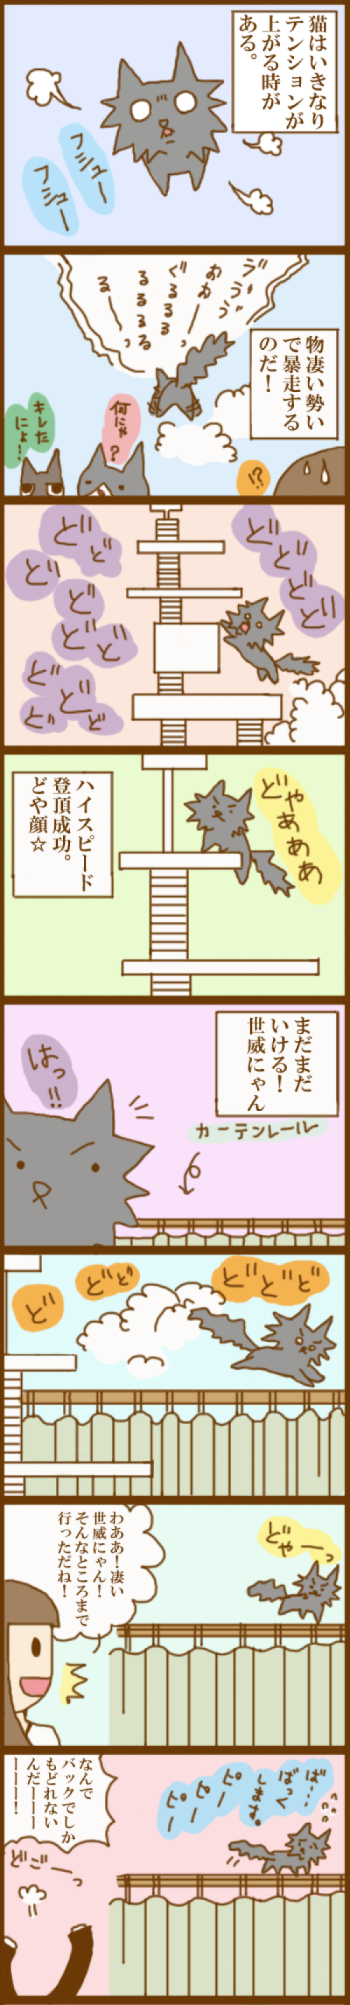 f:id:suzuokayu:20201118104335j:plain